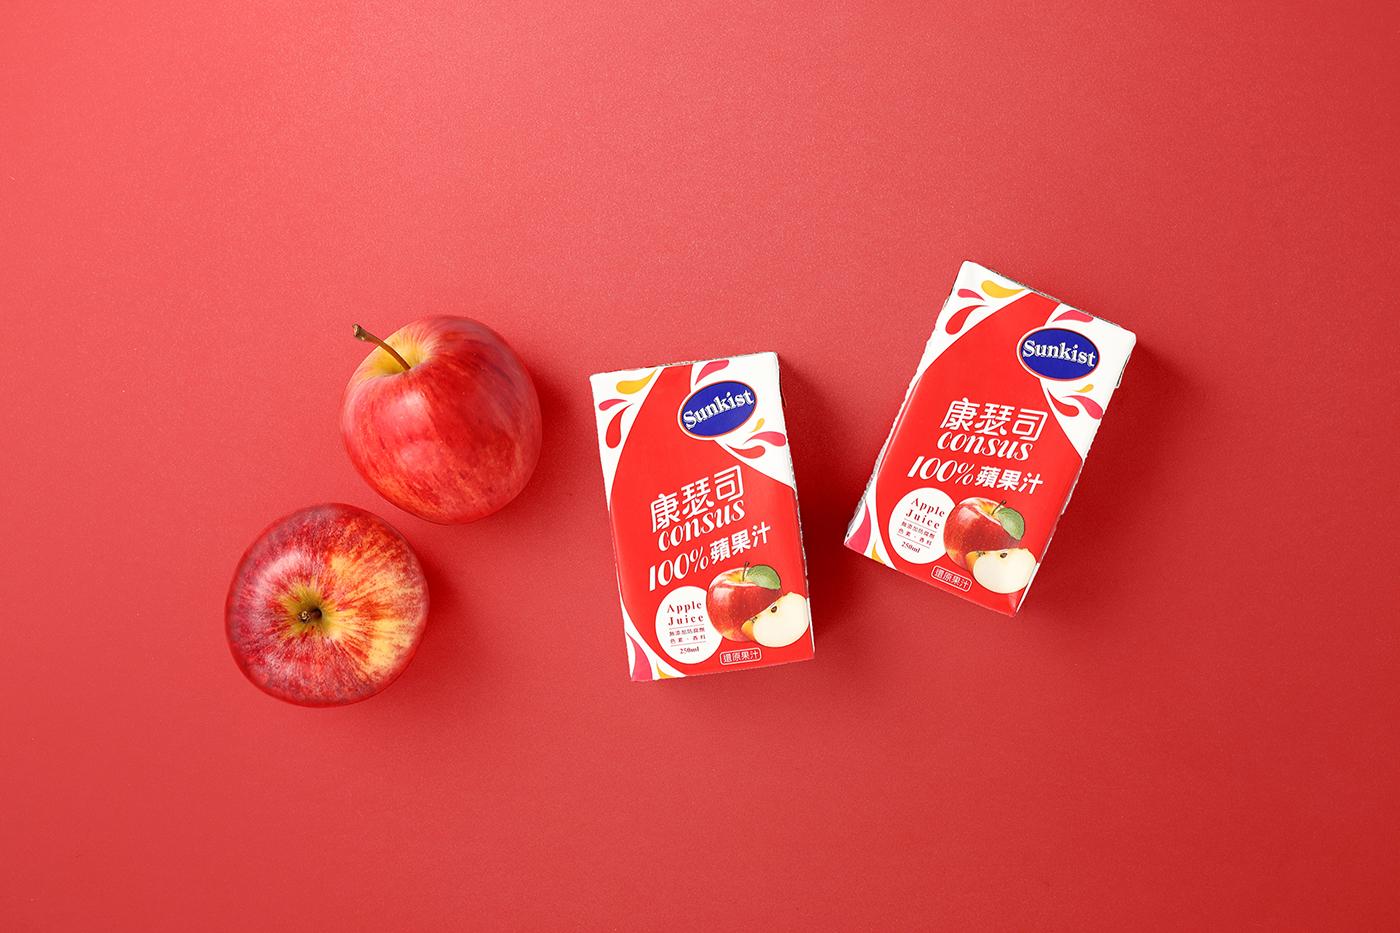 Sunkist Consus 100% fruit juice Packaging Design on Behance